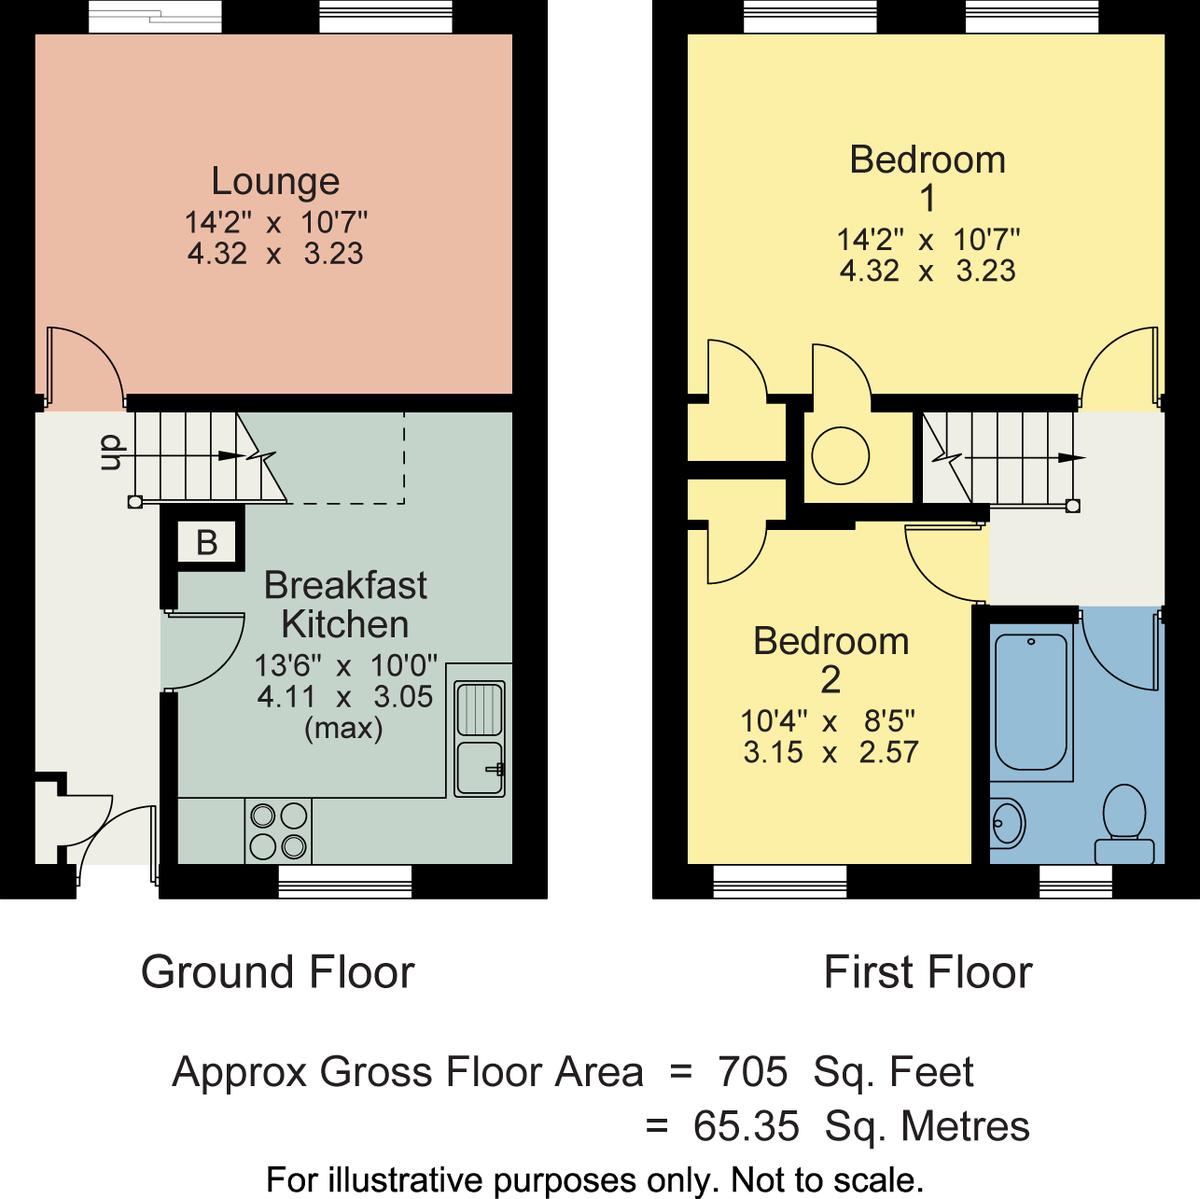 Floorplan 10 Oldfield Court, Windermere, Cumbria, LA23 2HH